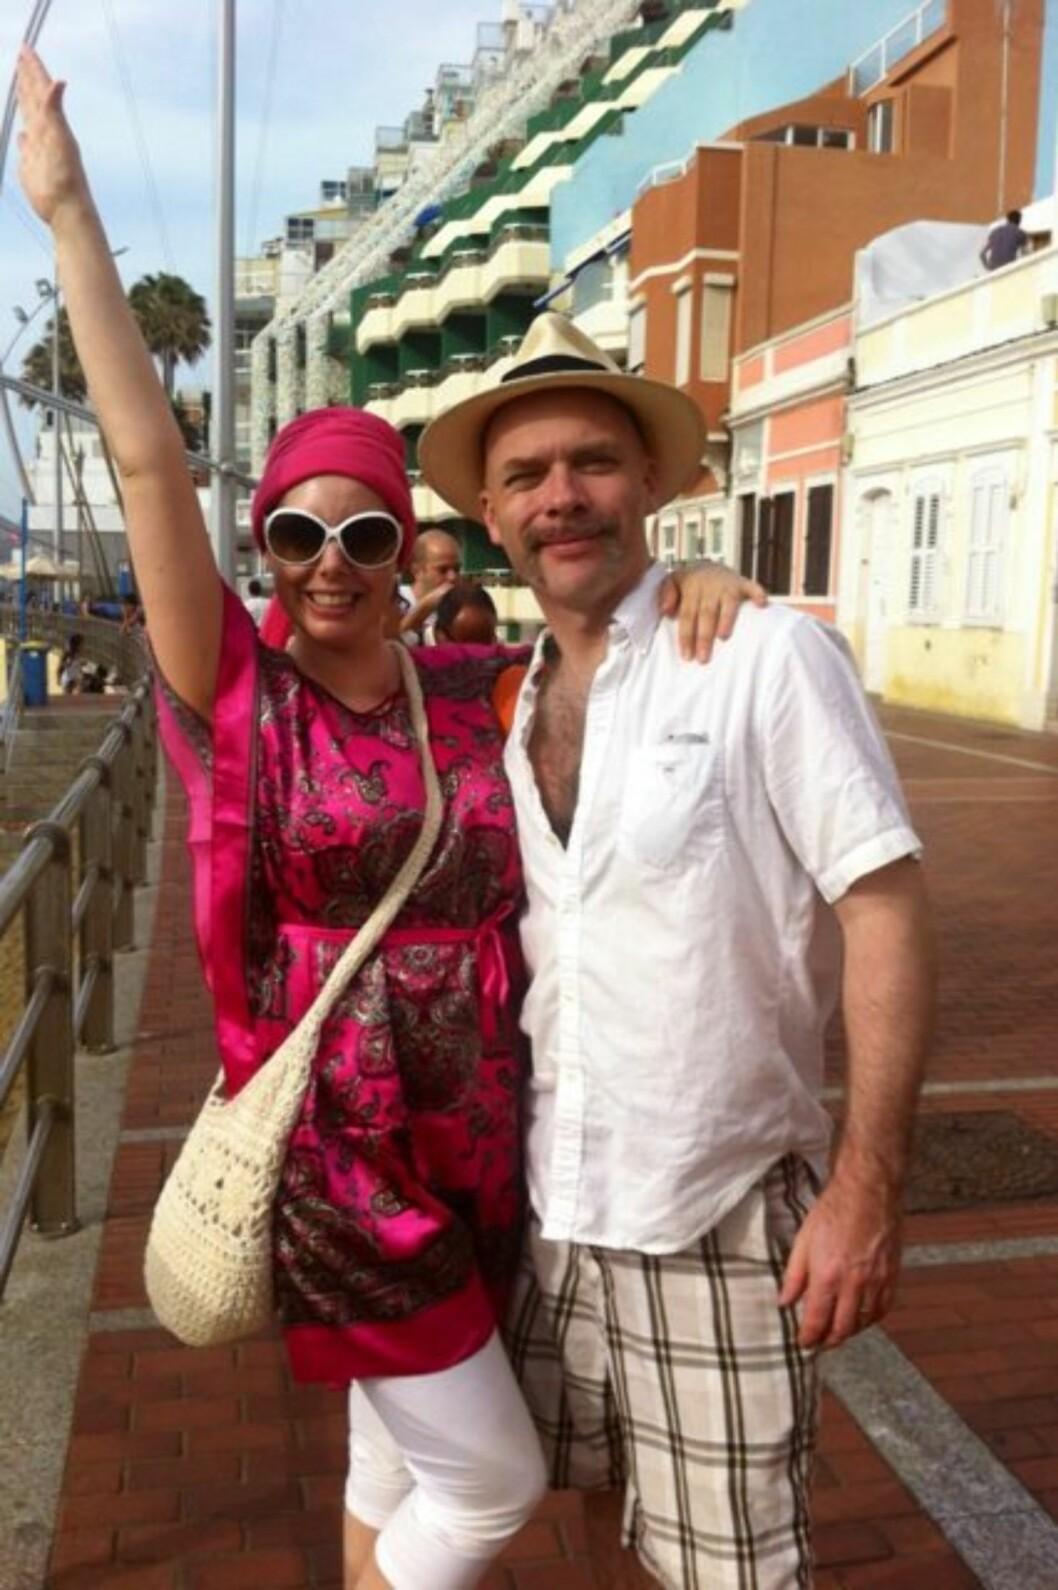 BEUNDRER ANBJØRG: Jono skriver også at han beundrer konas mot i kreftkampen. Foto: Privat